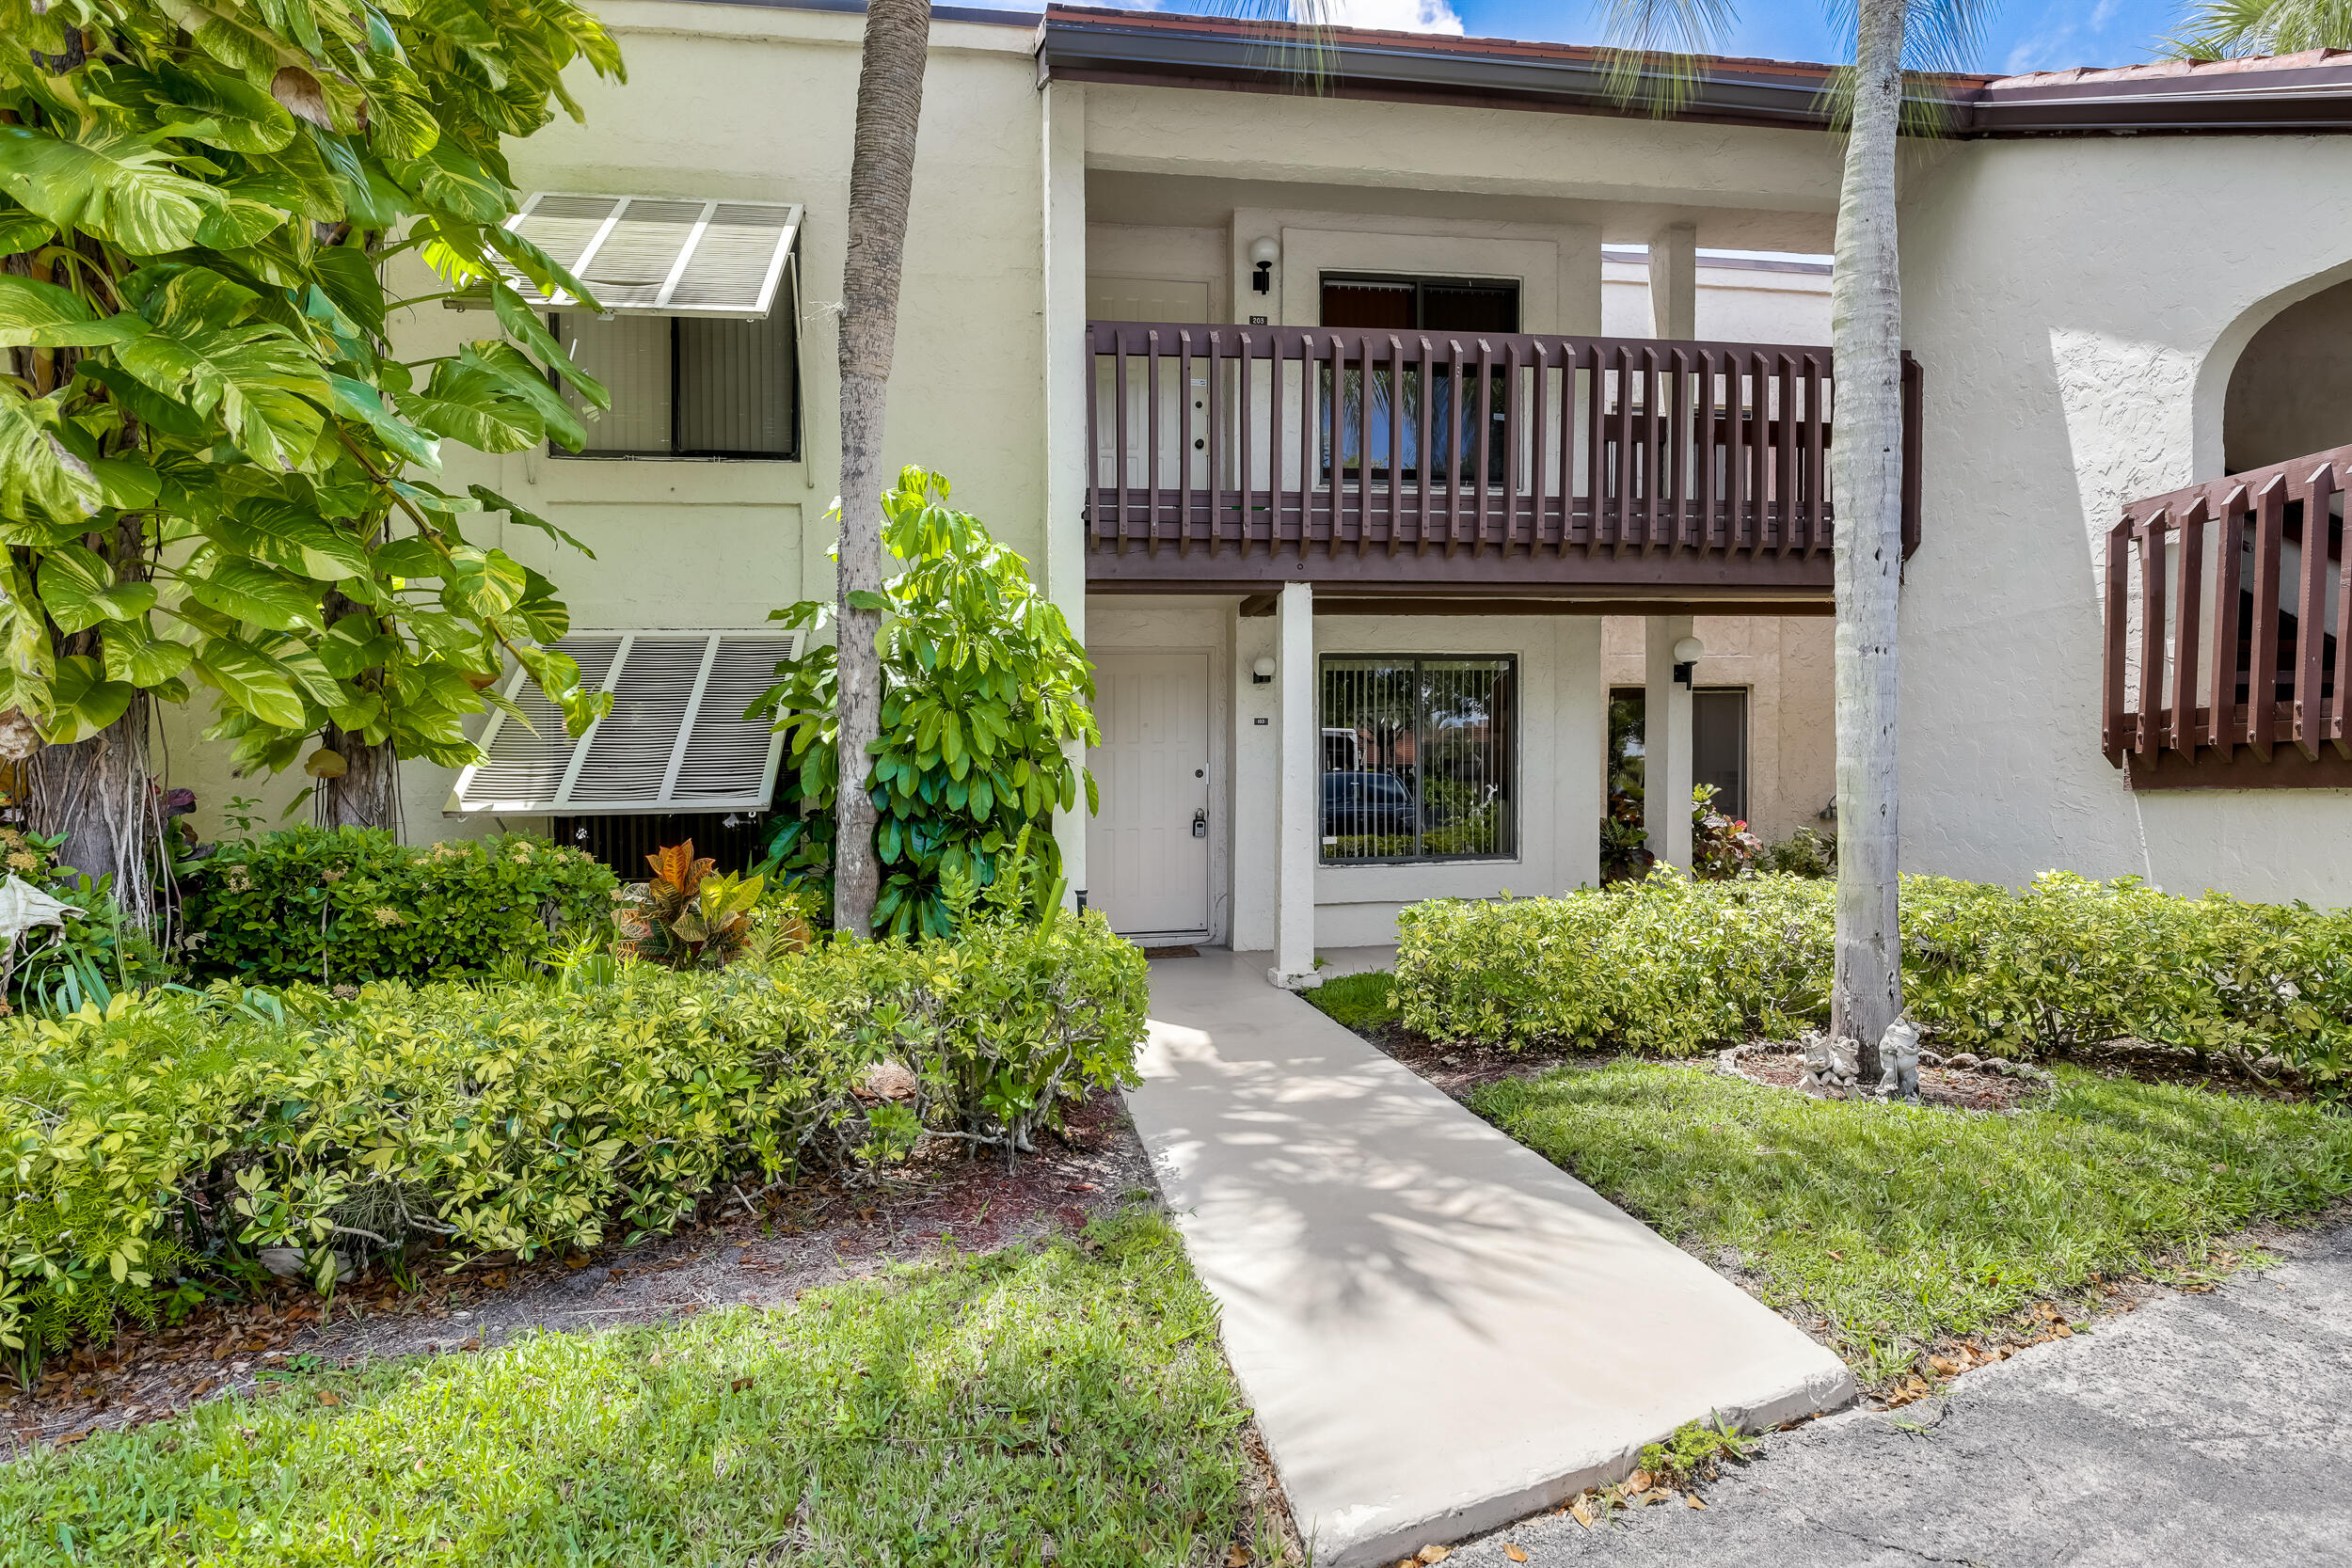 10155 Mangrove Drive 103 Boynton Beach, FL 33437